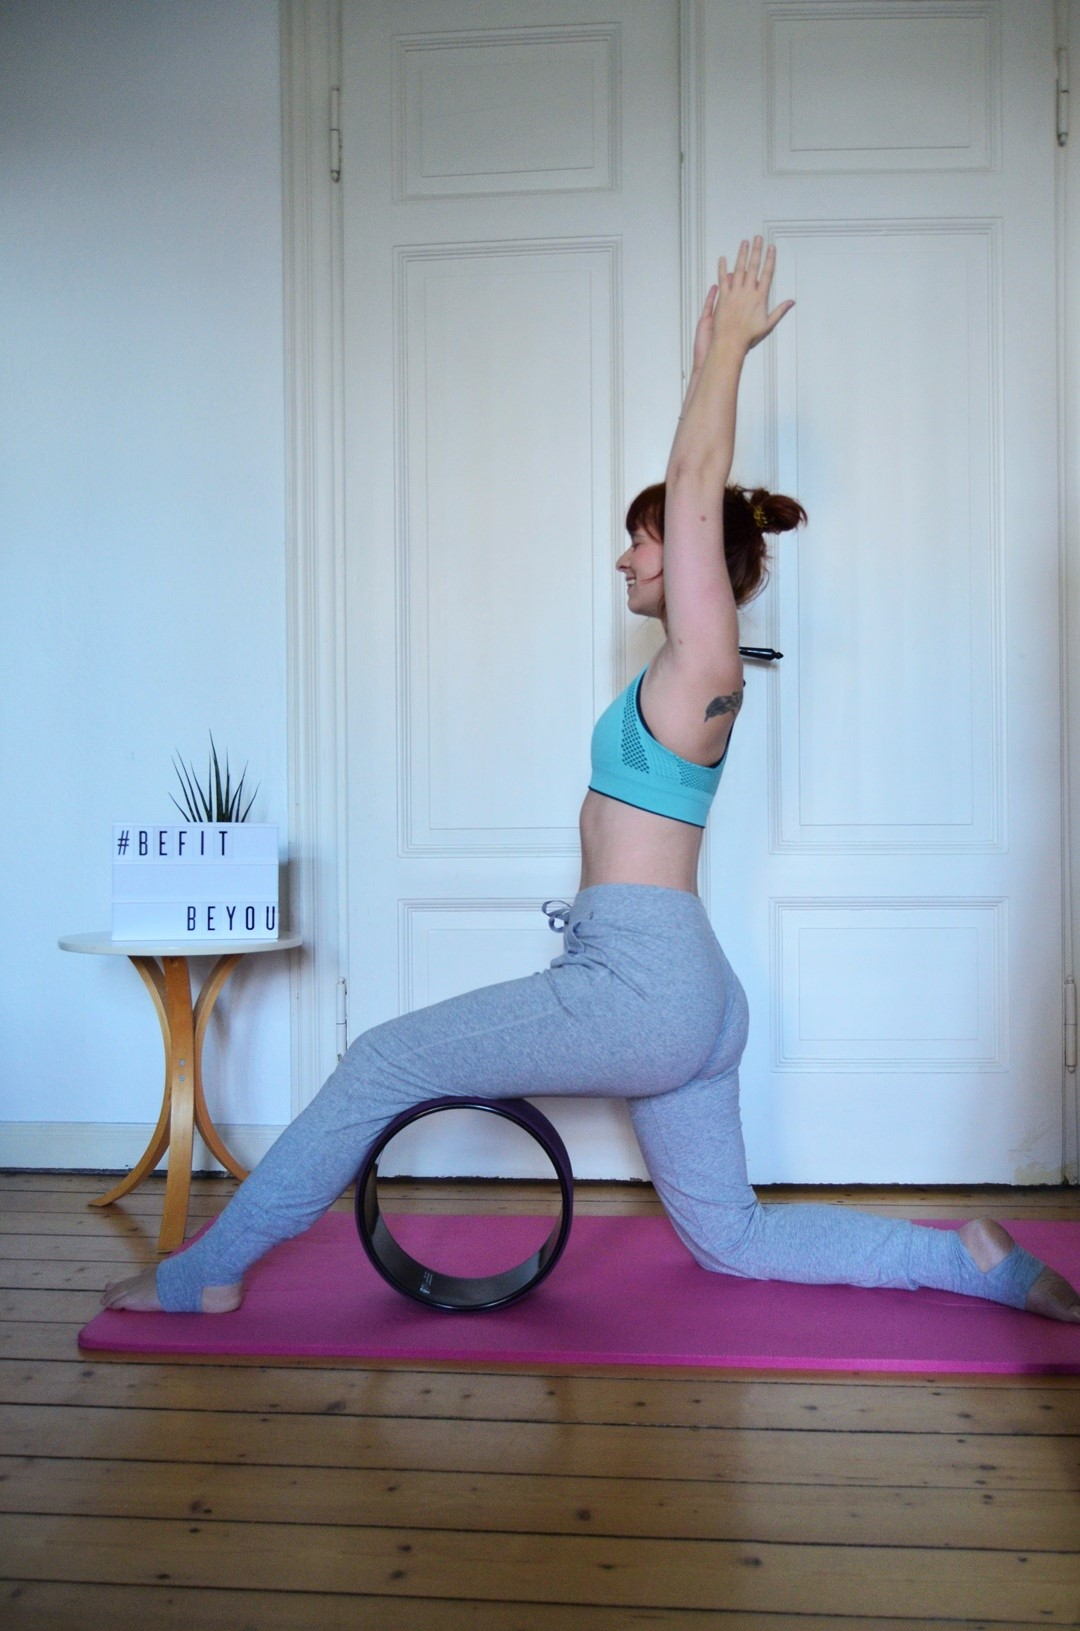 Tchibo_befitbeyou_be fit_Fitness_Yoga_Yogarad_Annanikabu